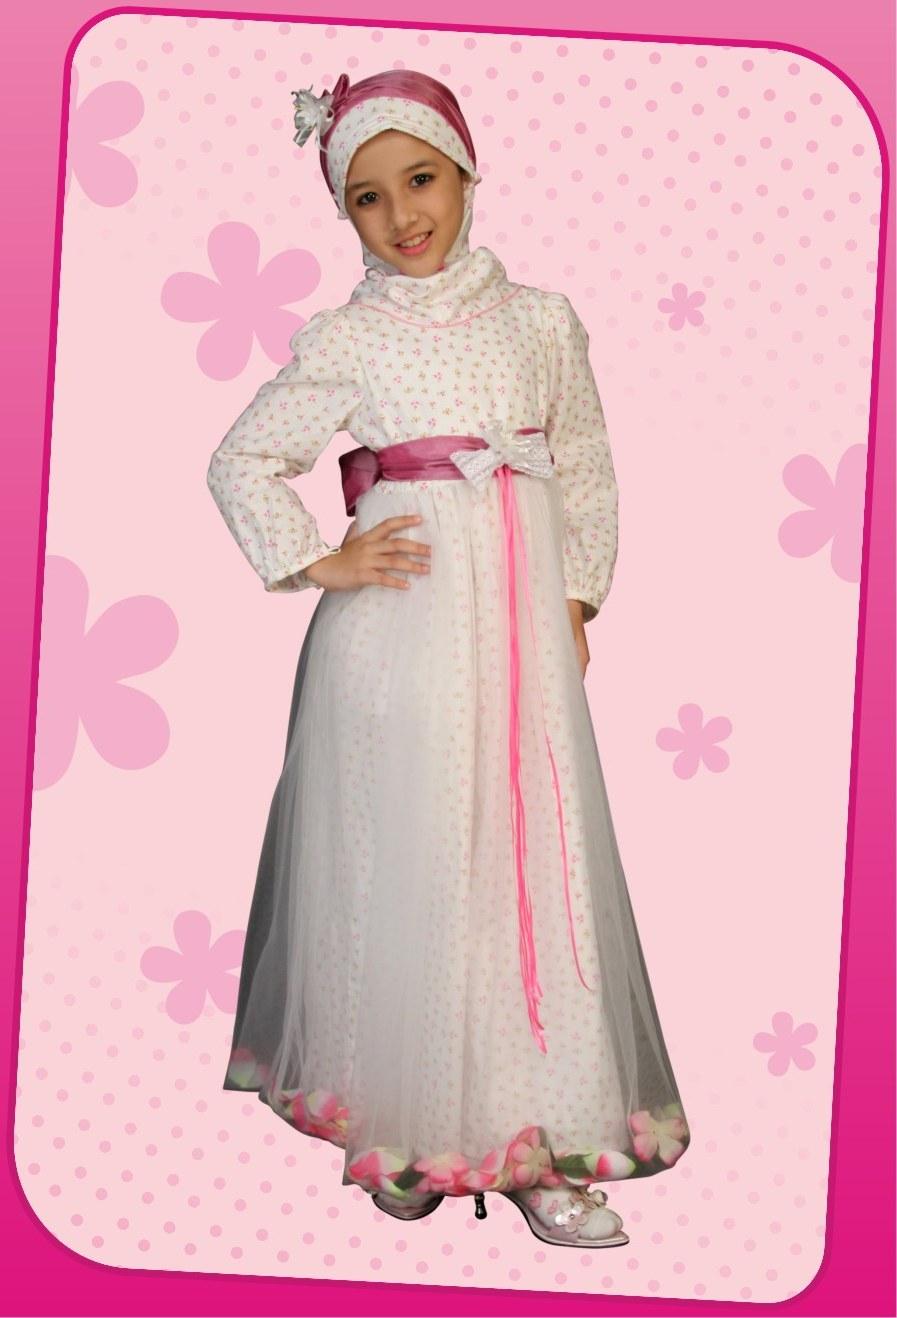 Inspirasi Baju Lebaran 2020 Anak Perempuan 87dx Trend Busana Muslim Anak Perempuan 2016 Busana Muslim Terbaru